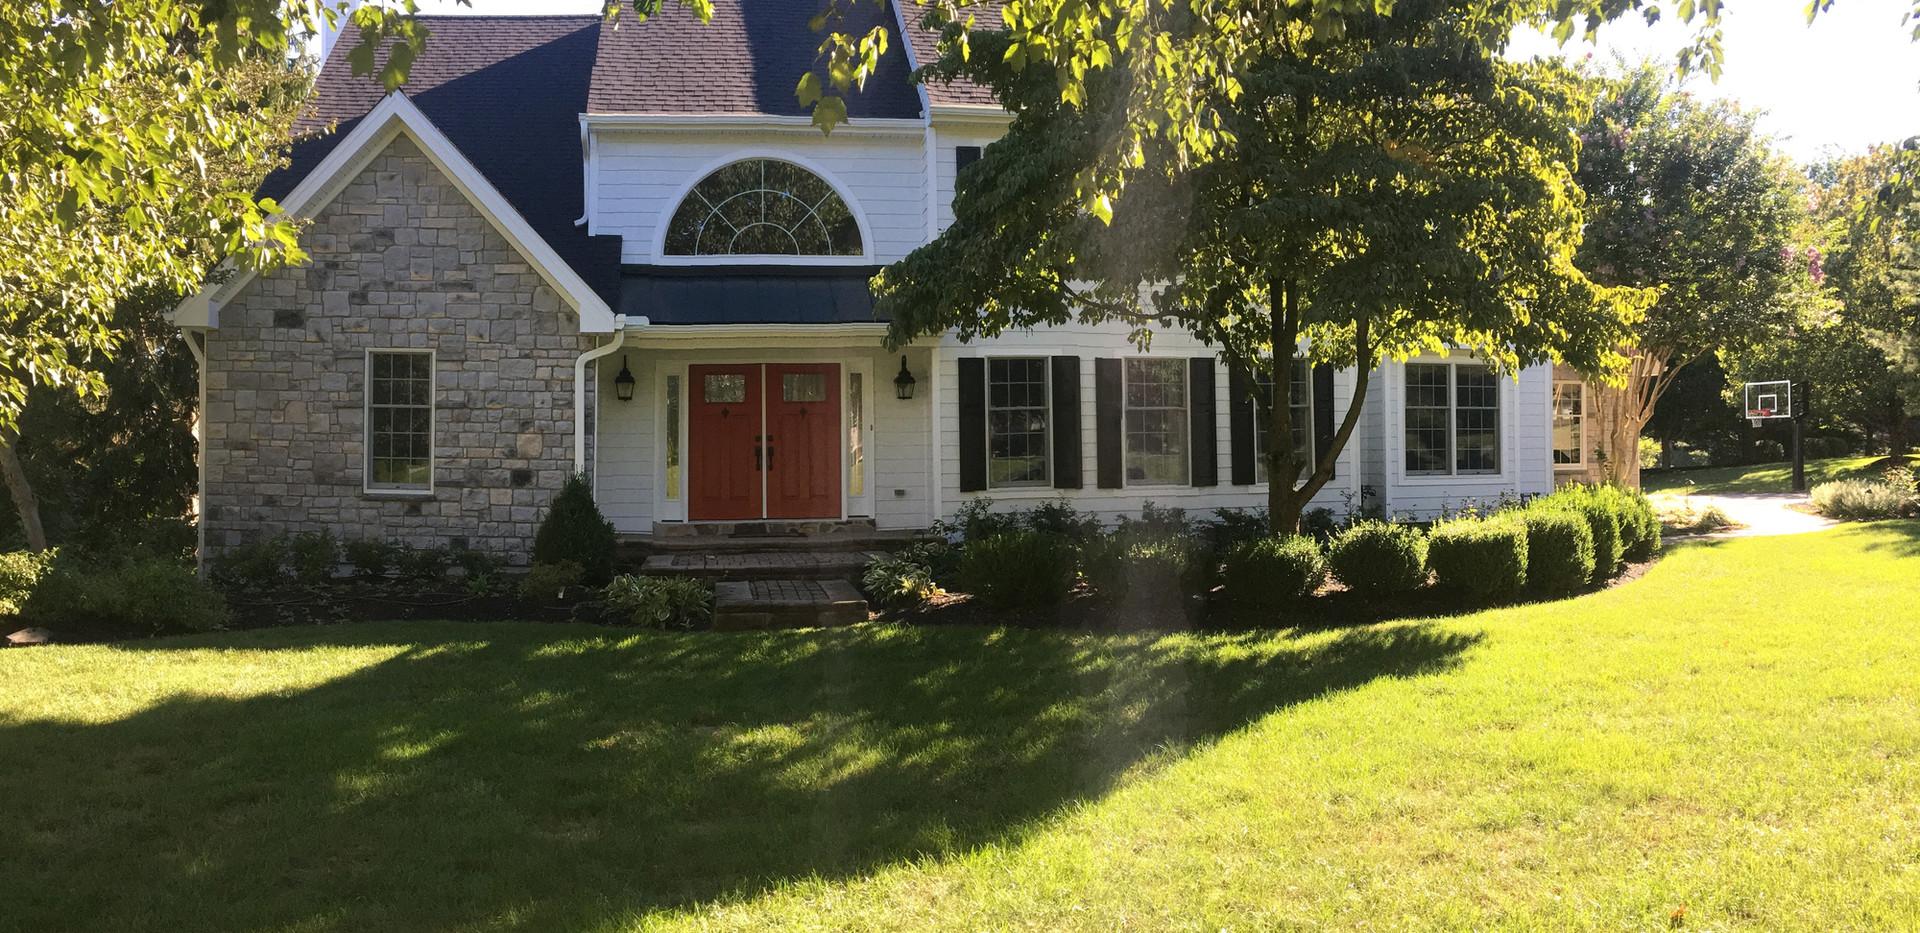 Home Renovation